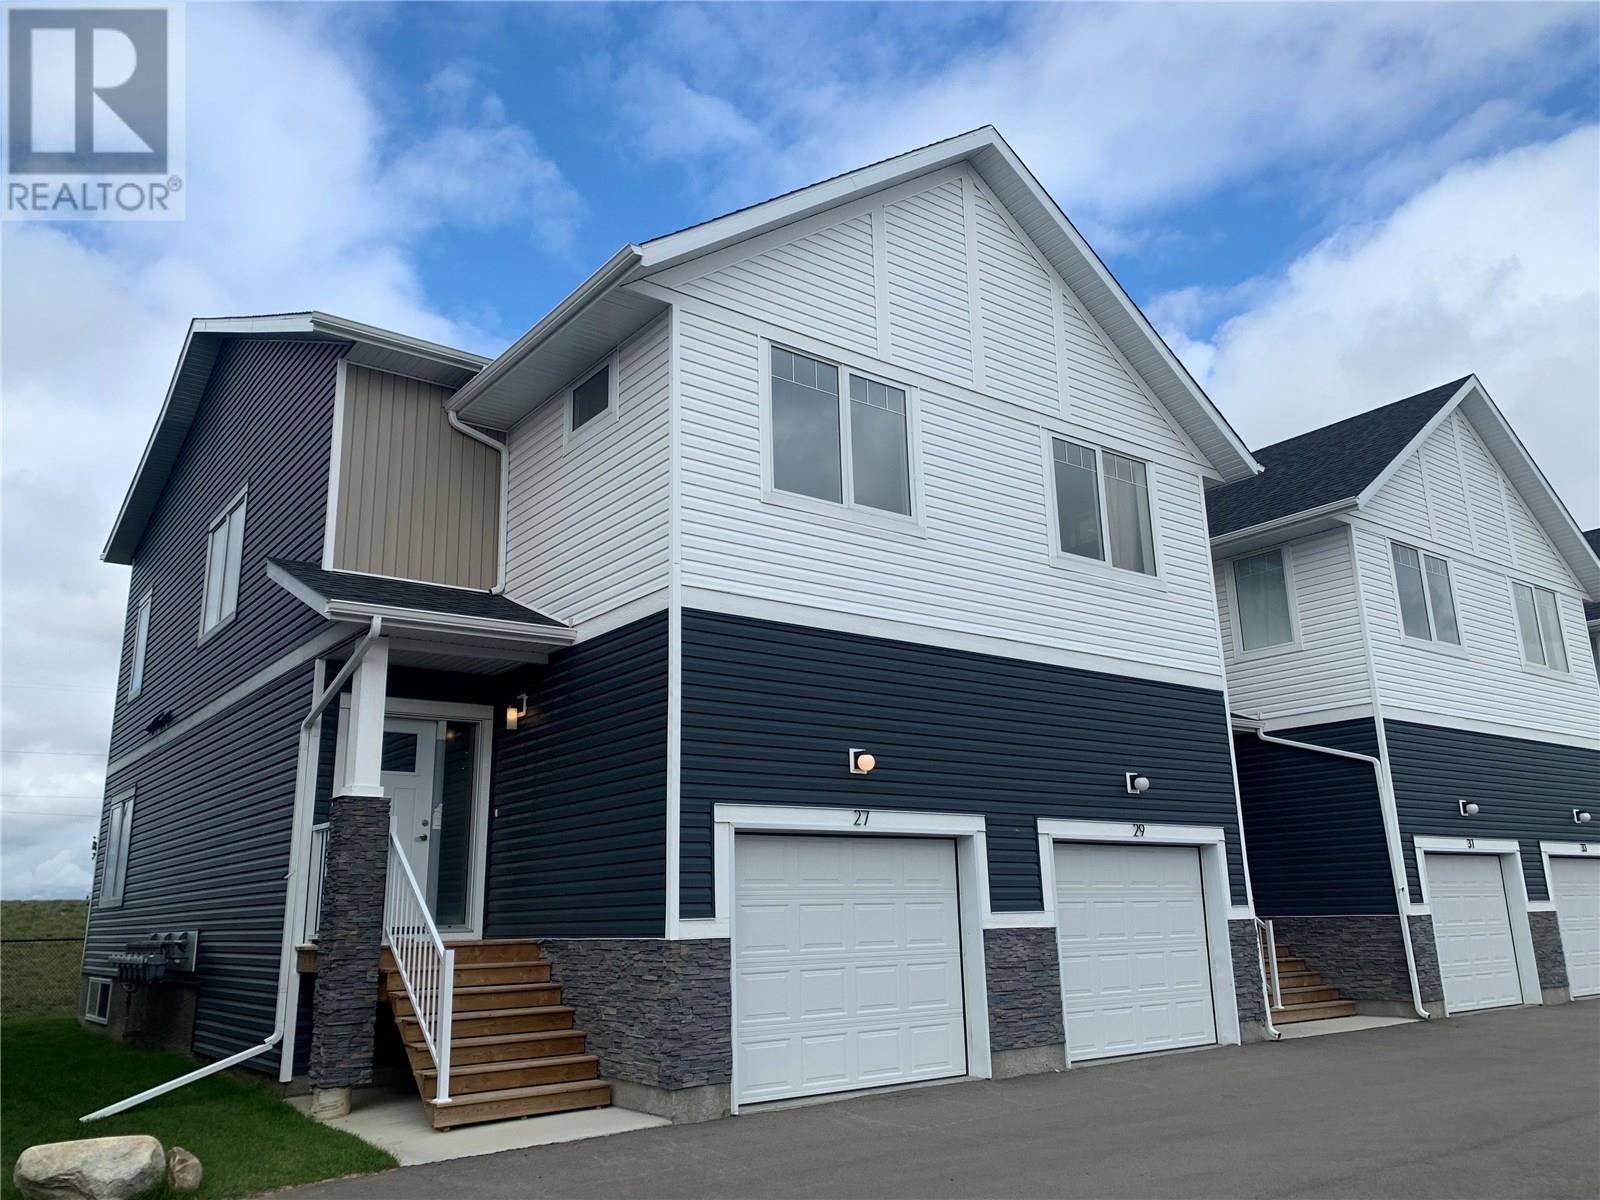 Buliding: 510 Kloppenburg Crescent, Saskatoon, SK